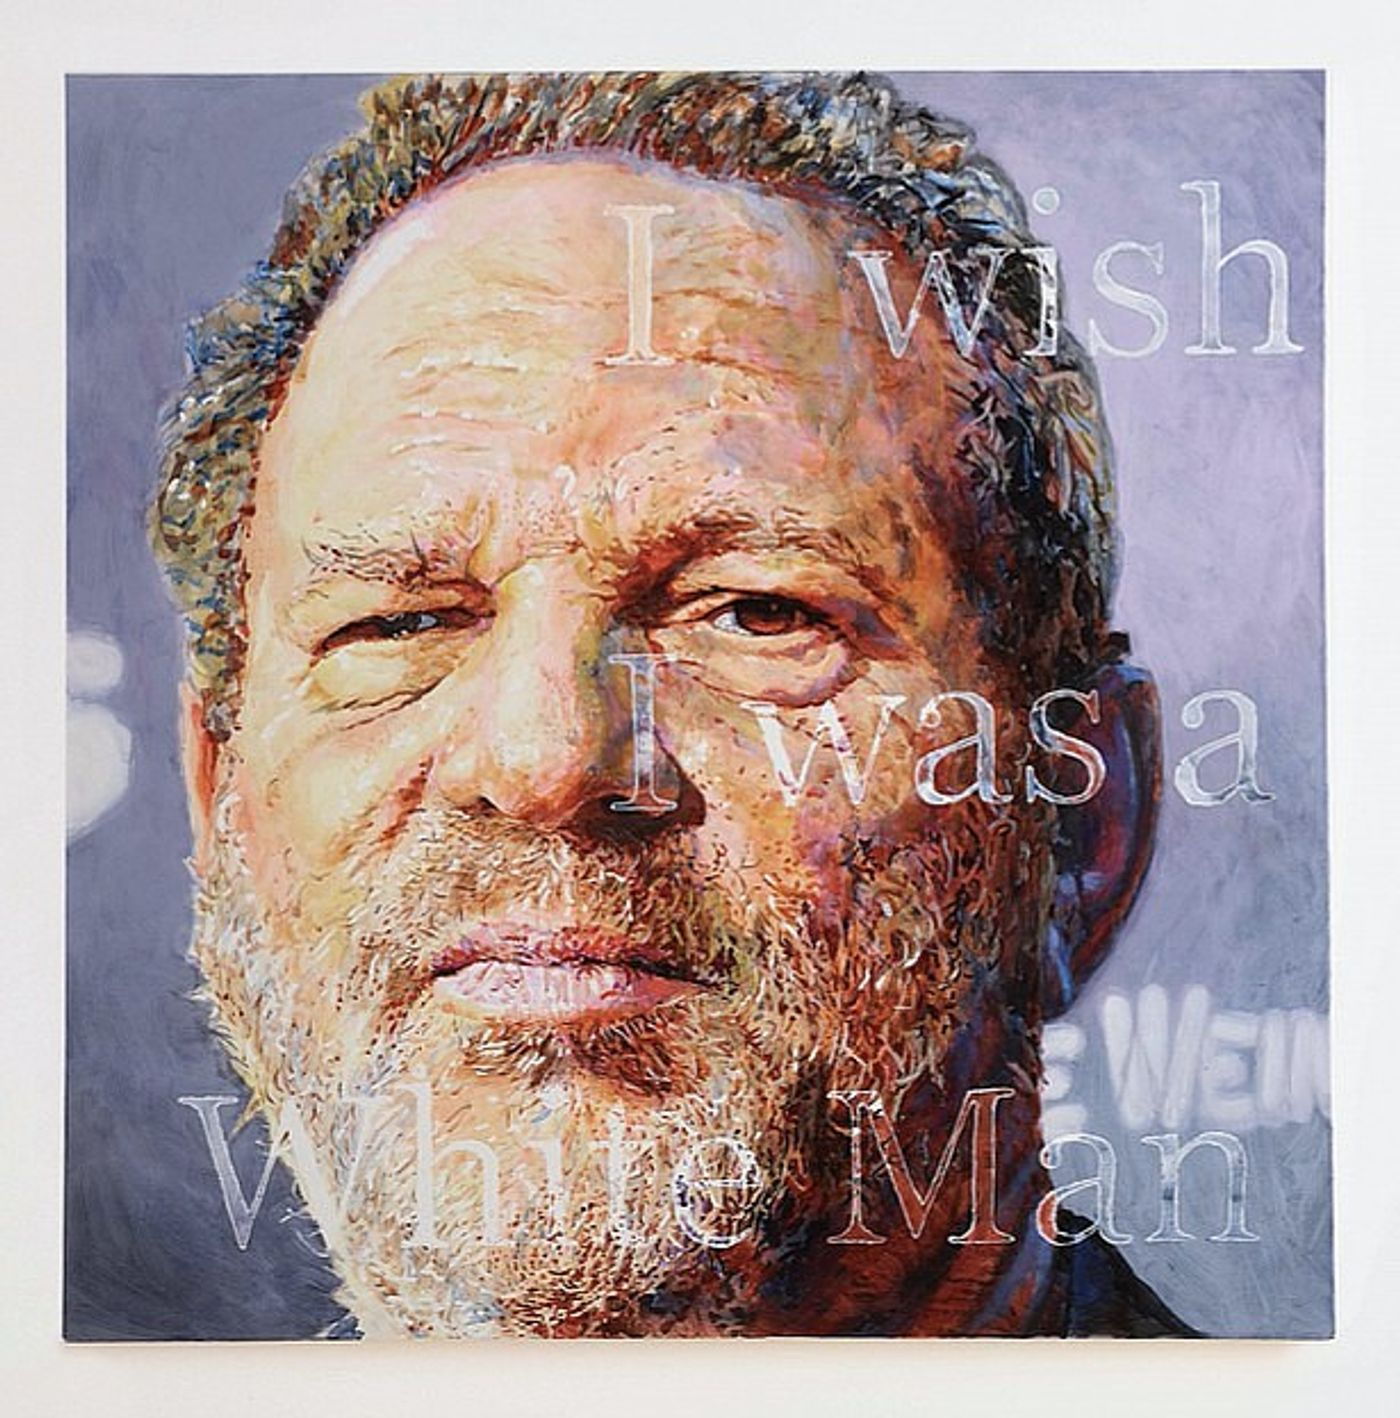 Christine Wang, Weinstein, 2018. Acrylic on canvas, 48 x 48 (121.9 x 121.9 cm).